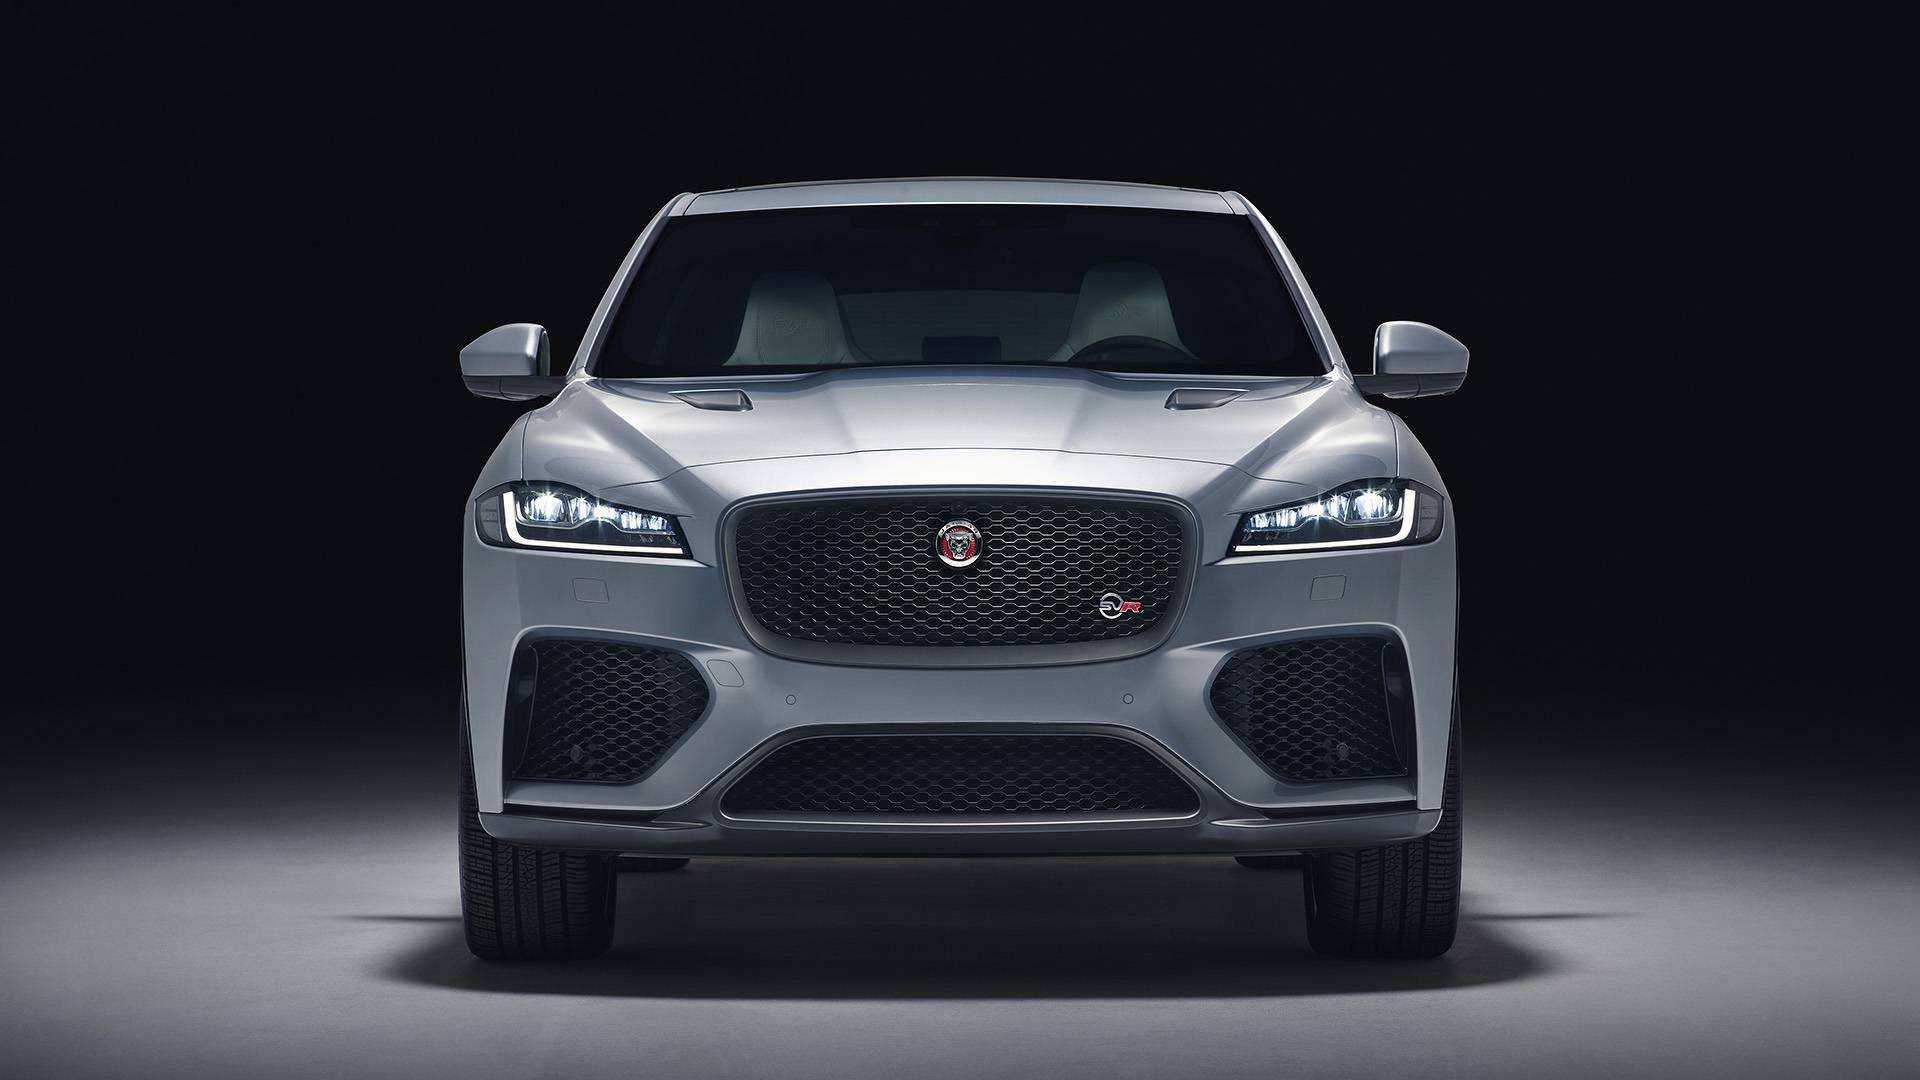 76 Gallery of Jaguar J 2020 Research New with Jaguar J 2020